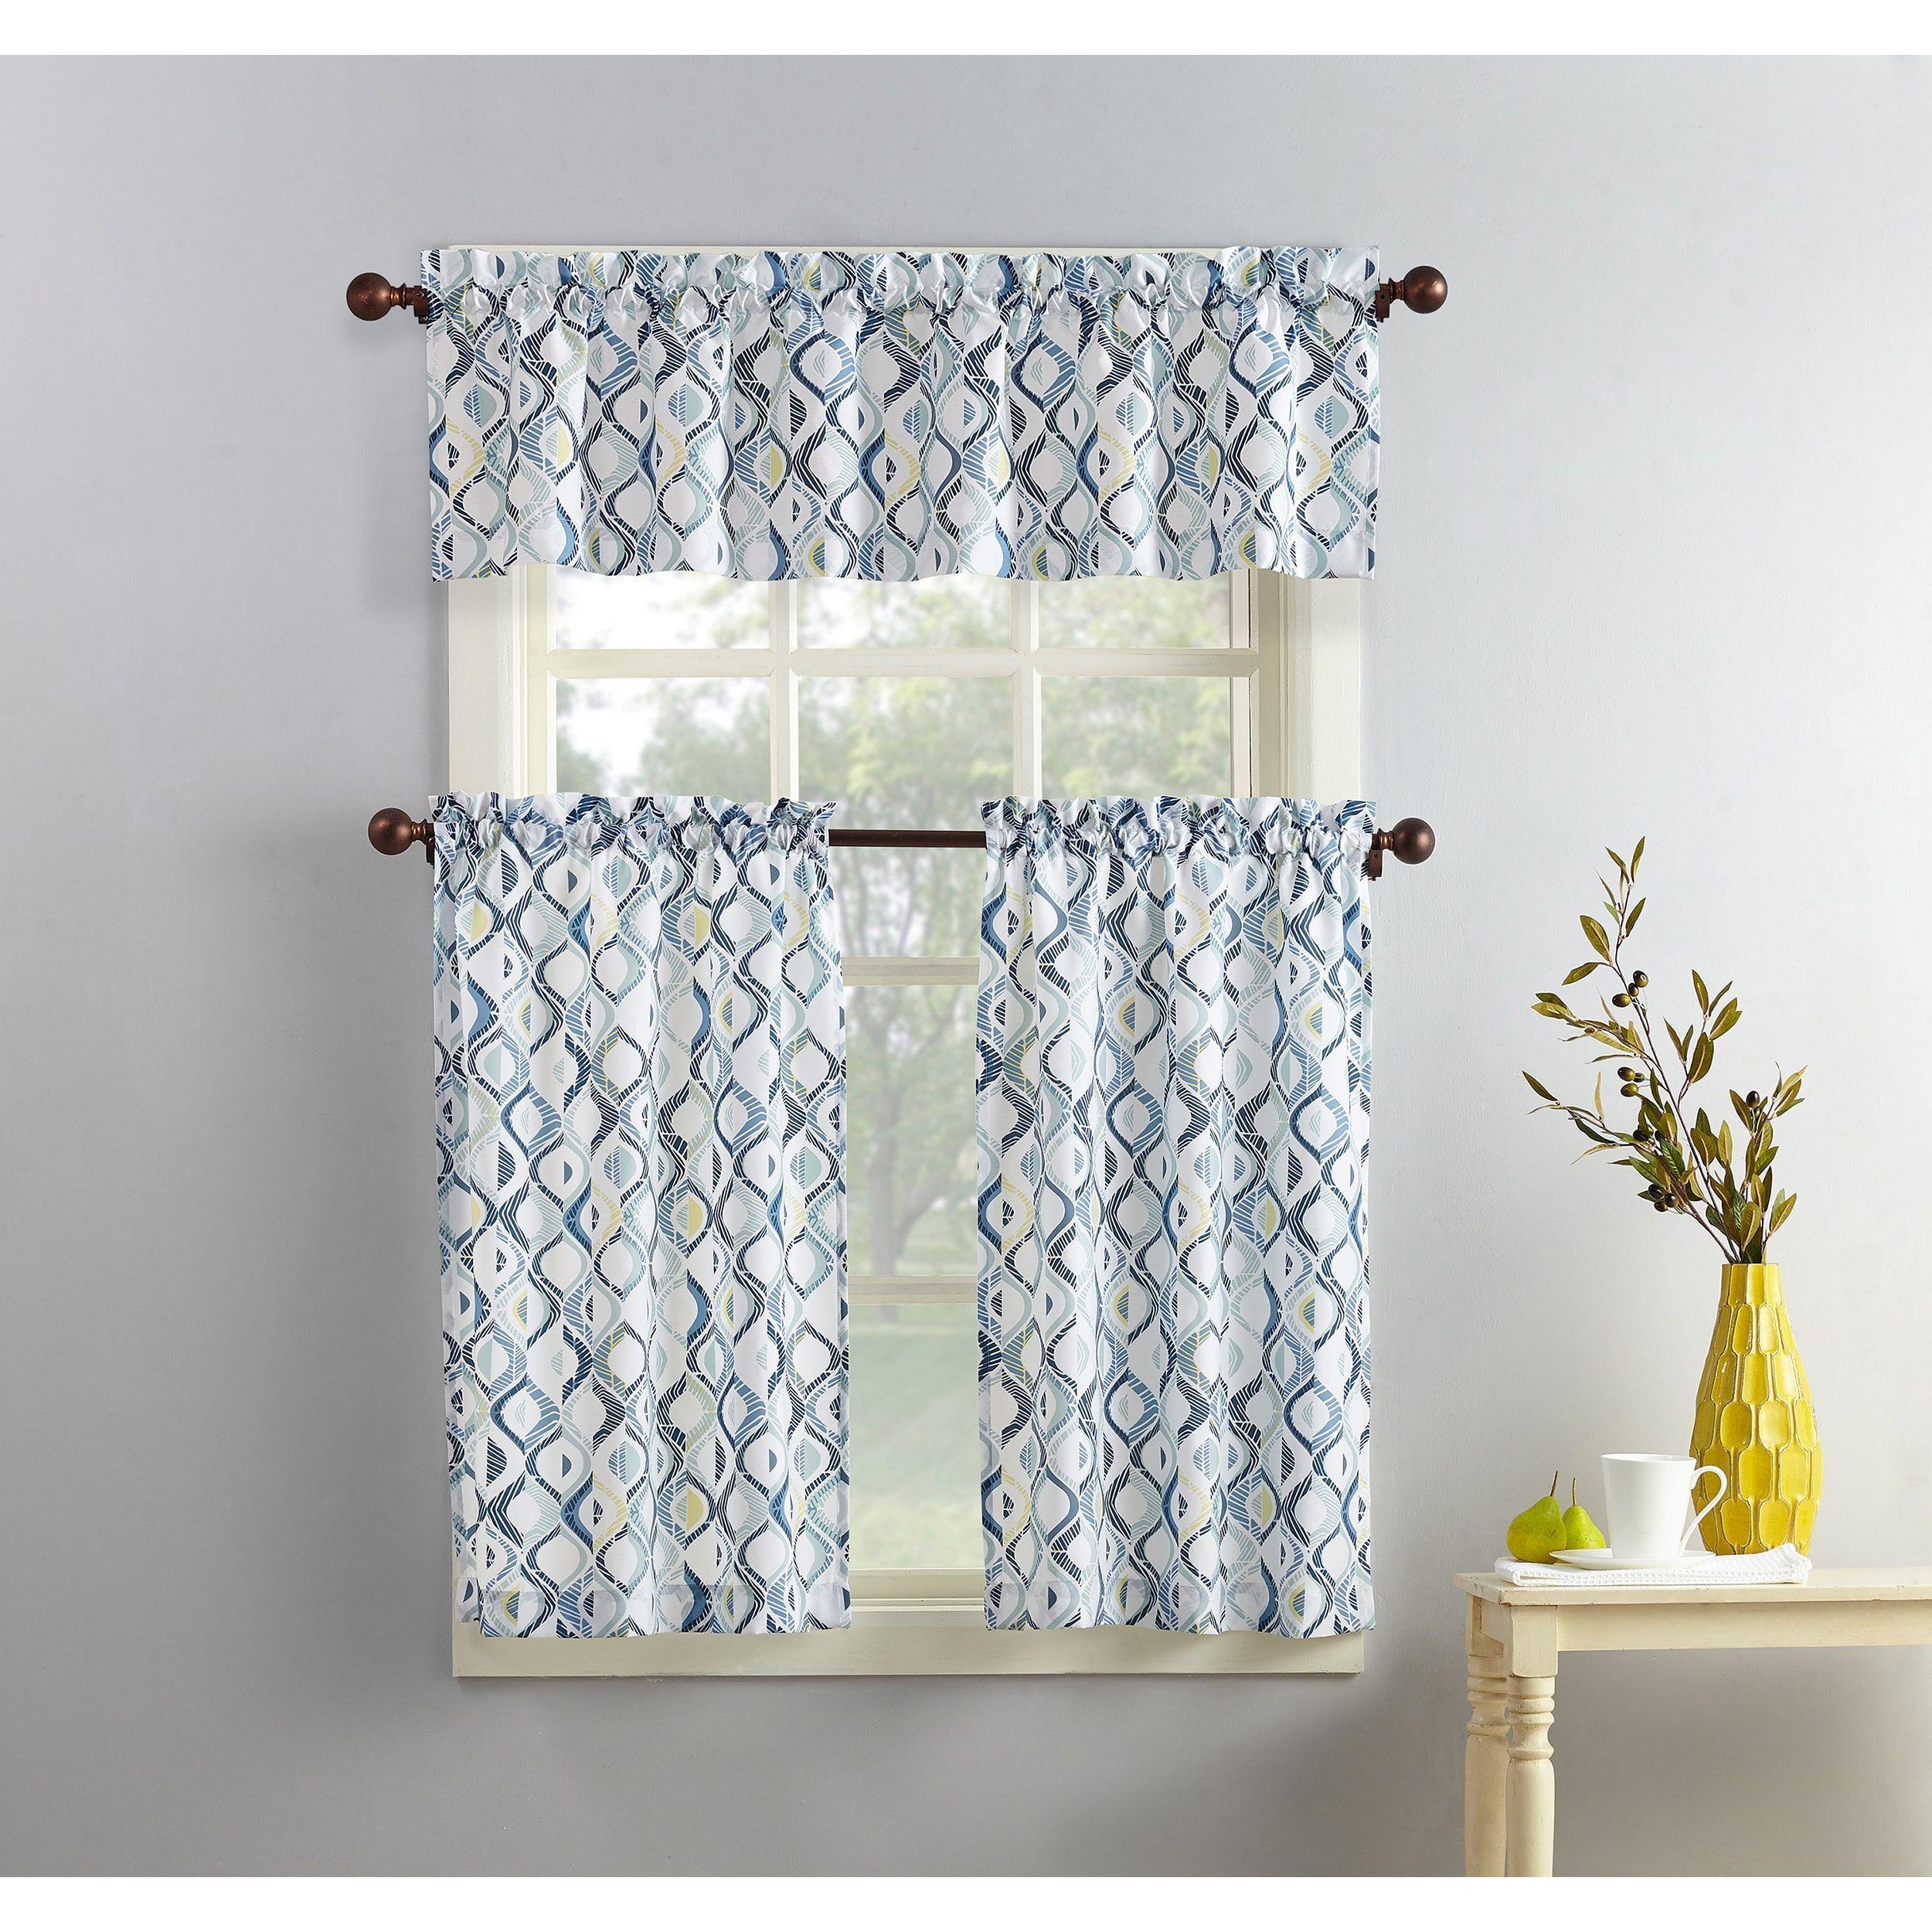 No 918 Geometric Print Microfiber 3 Piece Kitchen Curtain Valance